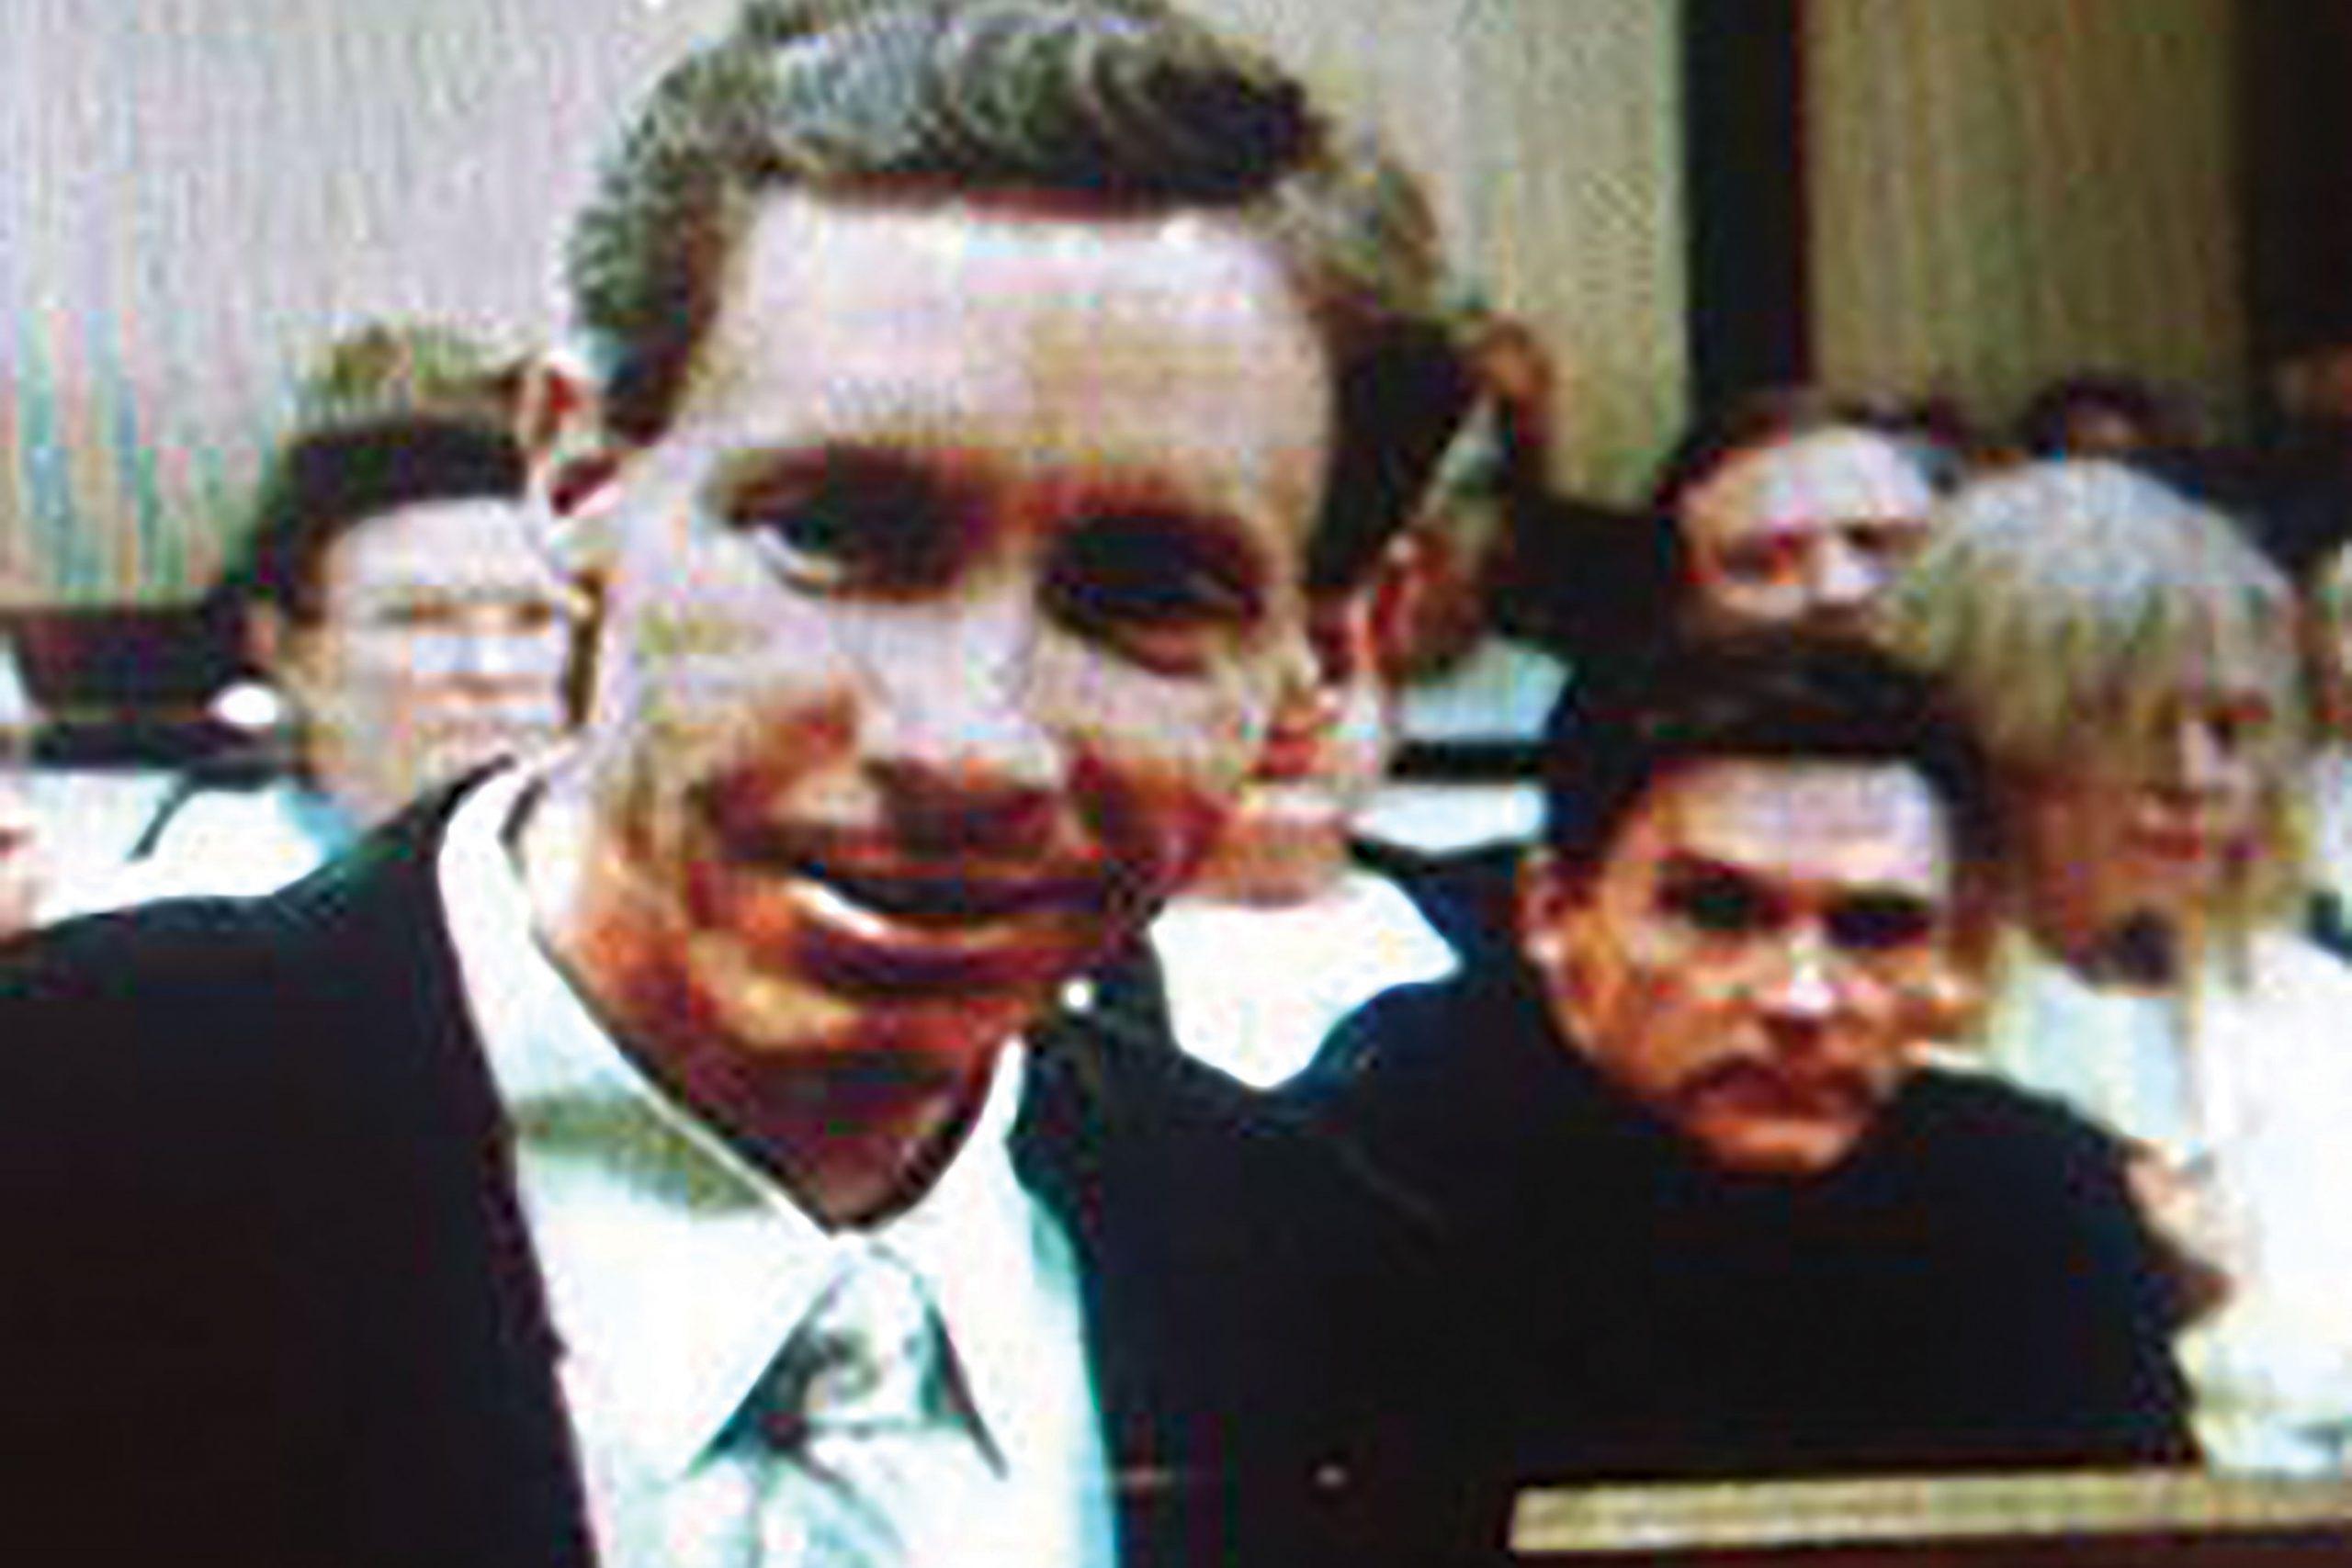 bird-dogging polygamist Warren Jeffs in St. George, Utah, during a 2008 trial; Photo courtesy Mike Watkiss